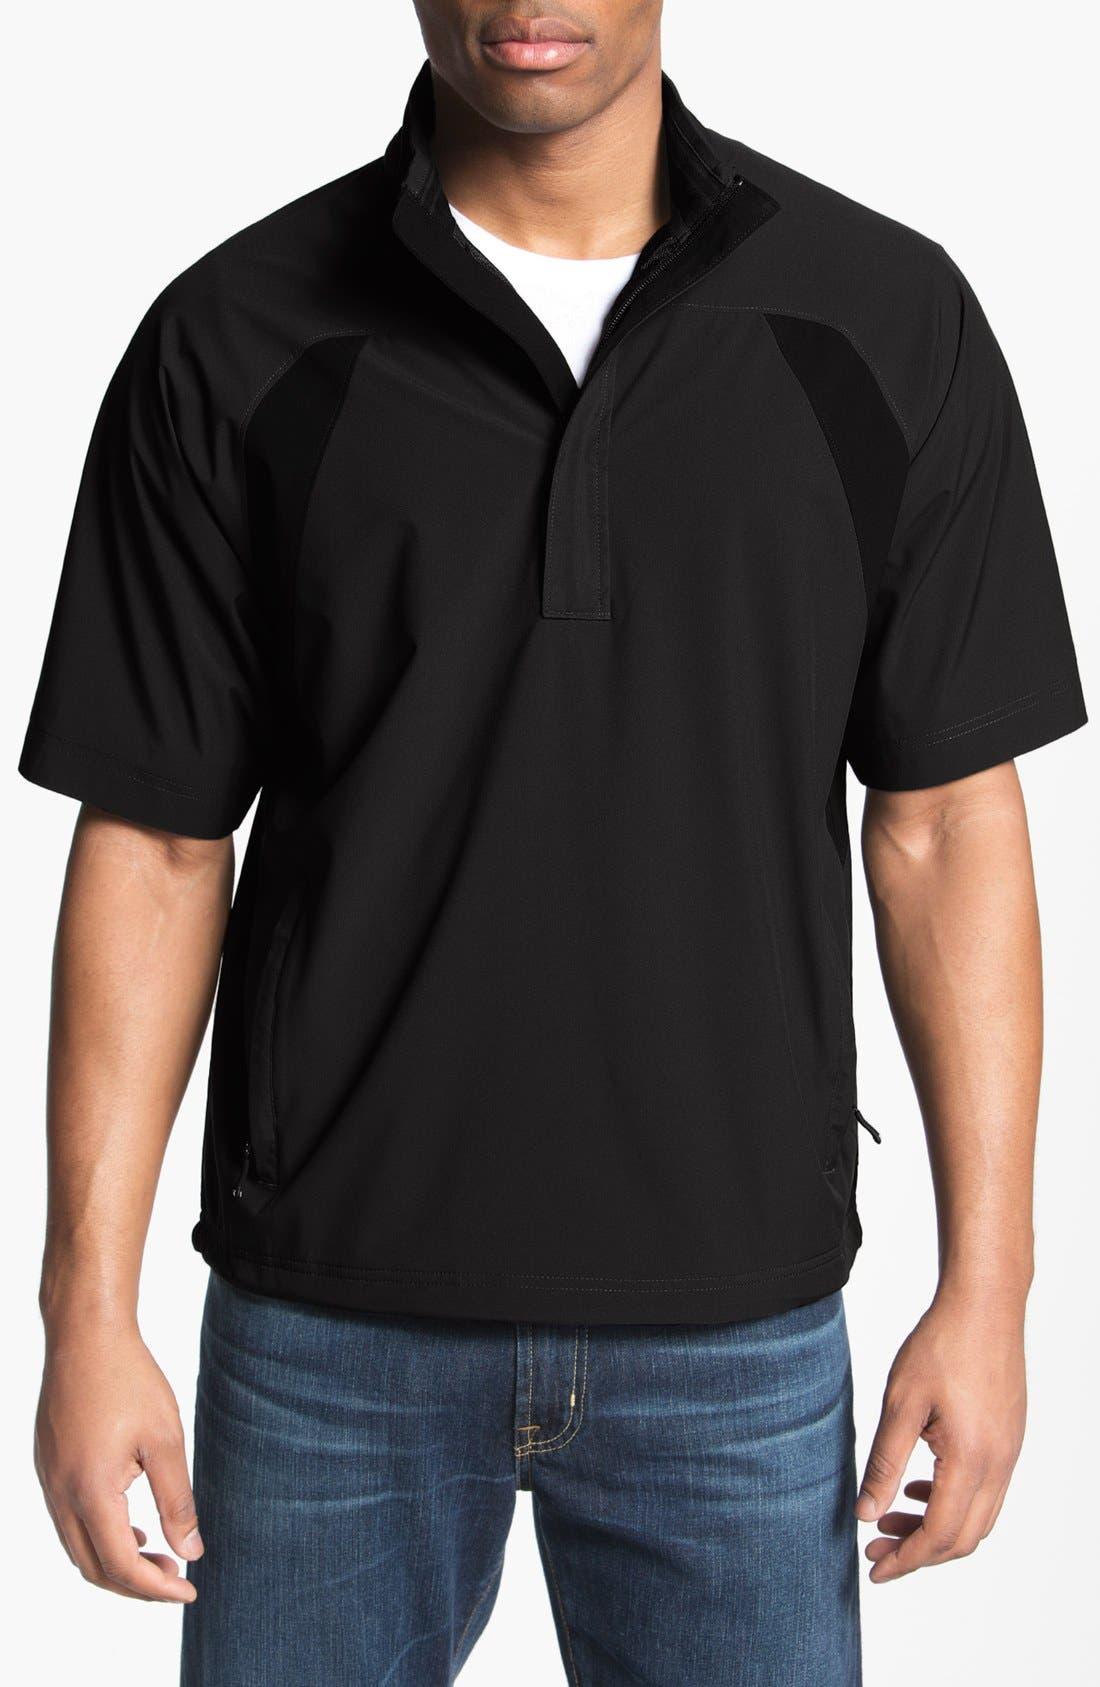 Main Image - Cutter & Buck 'Vital' Quarter Zip Short Sleeve Mid Layer